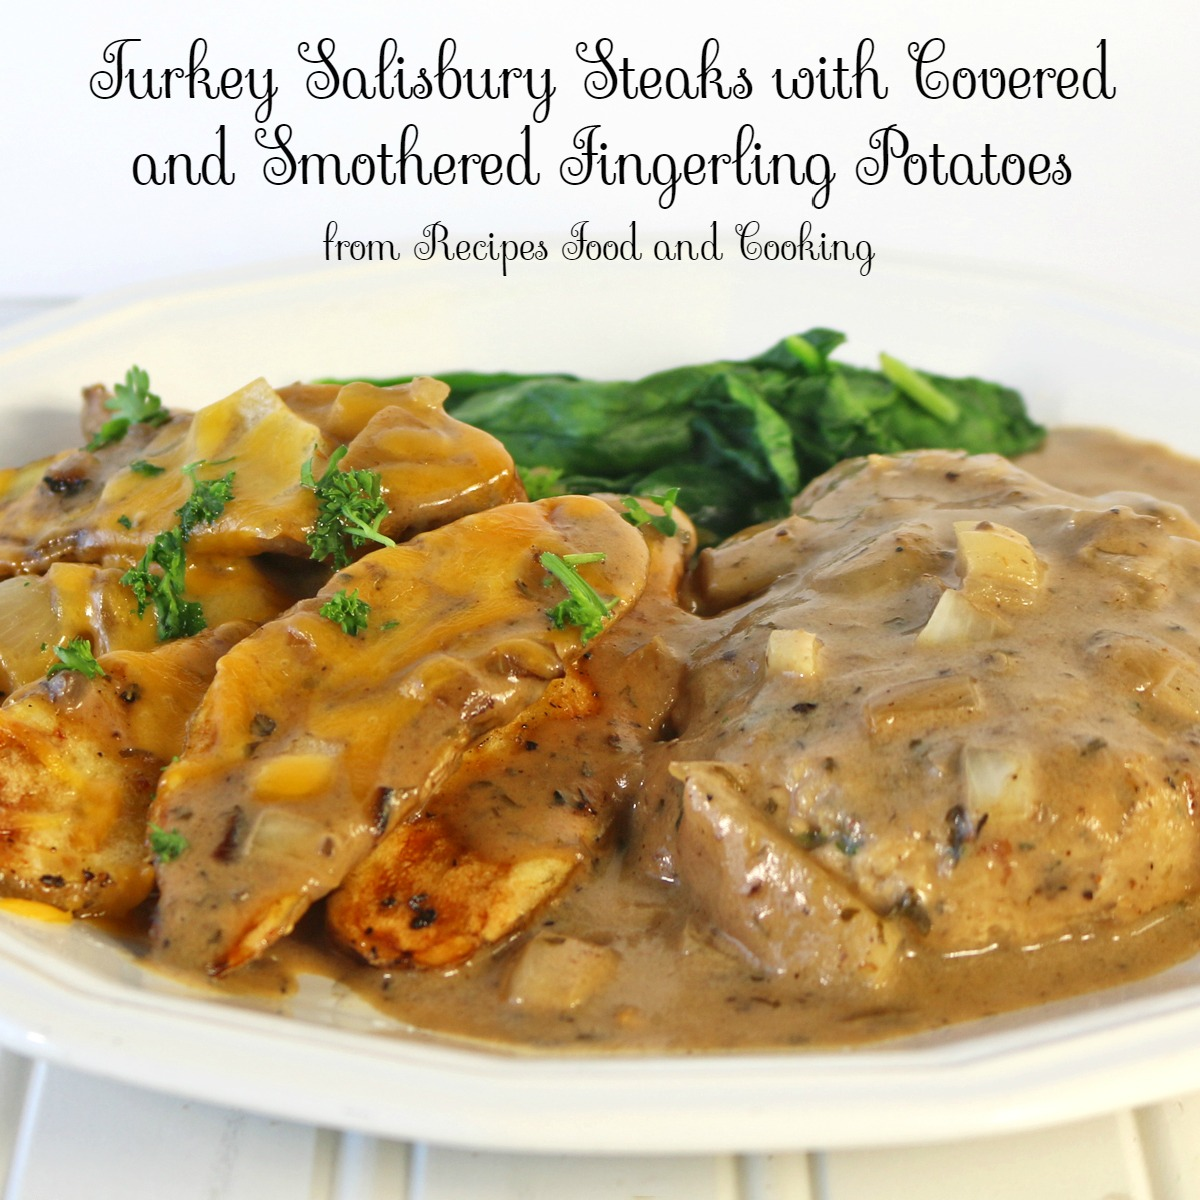 Easy Turkey Salisbury Steaks Recipes Food And Cooking